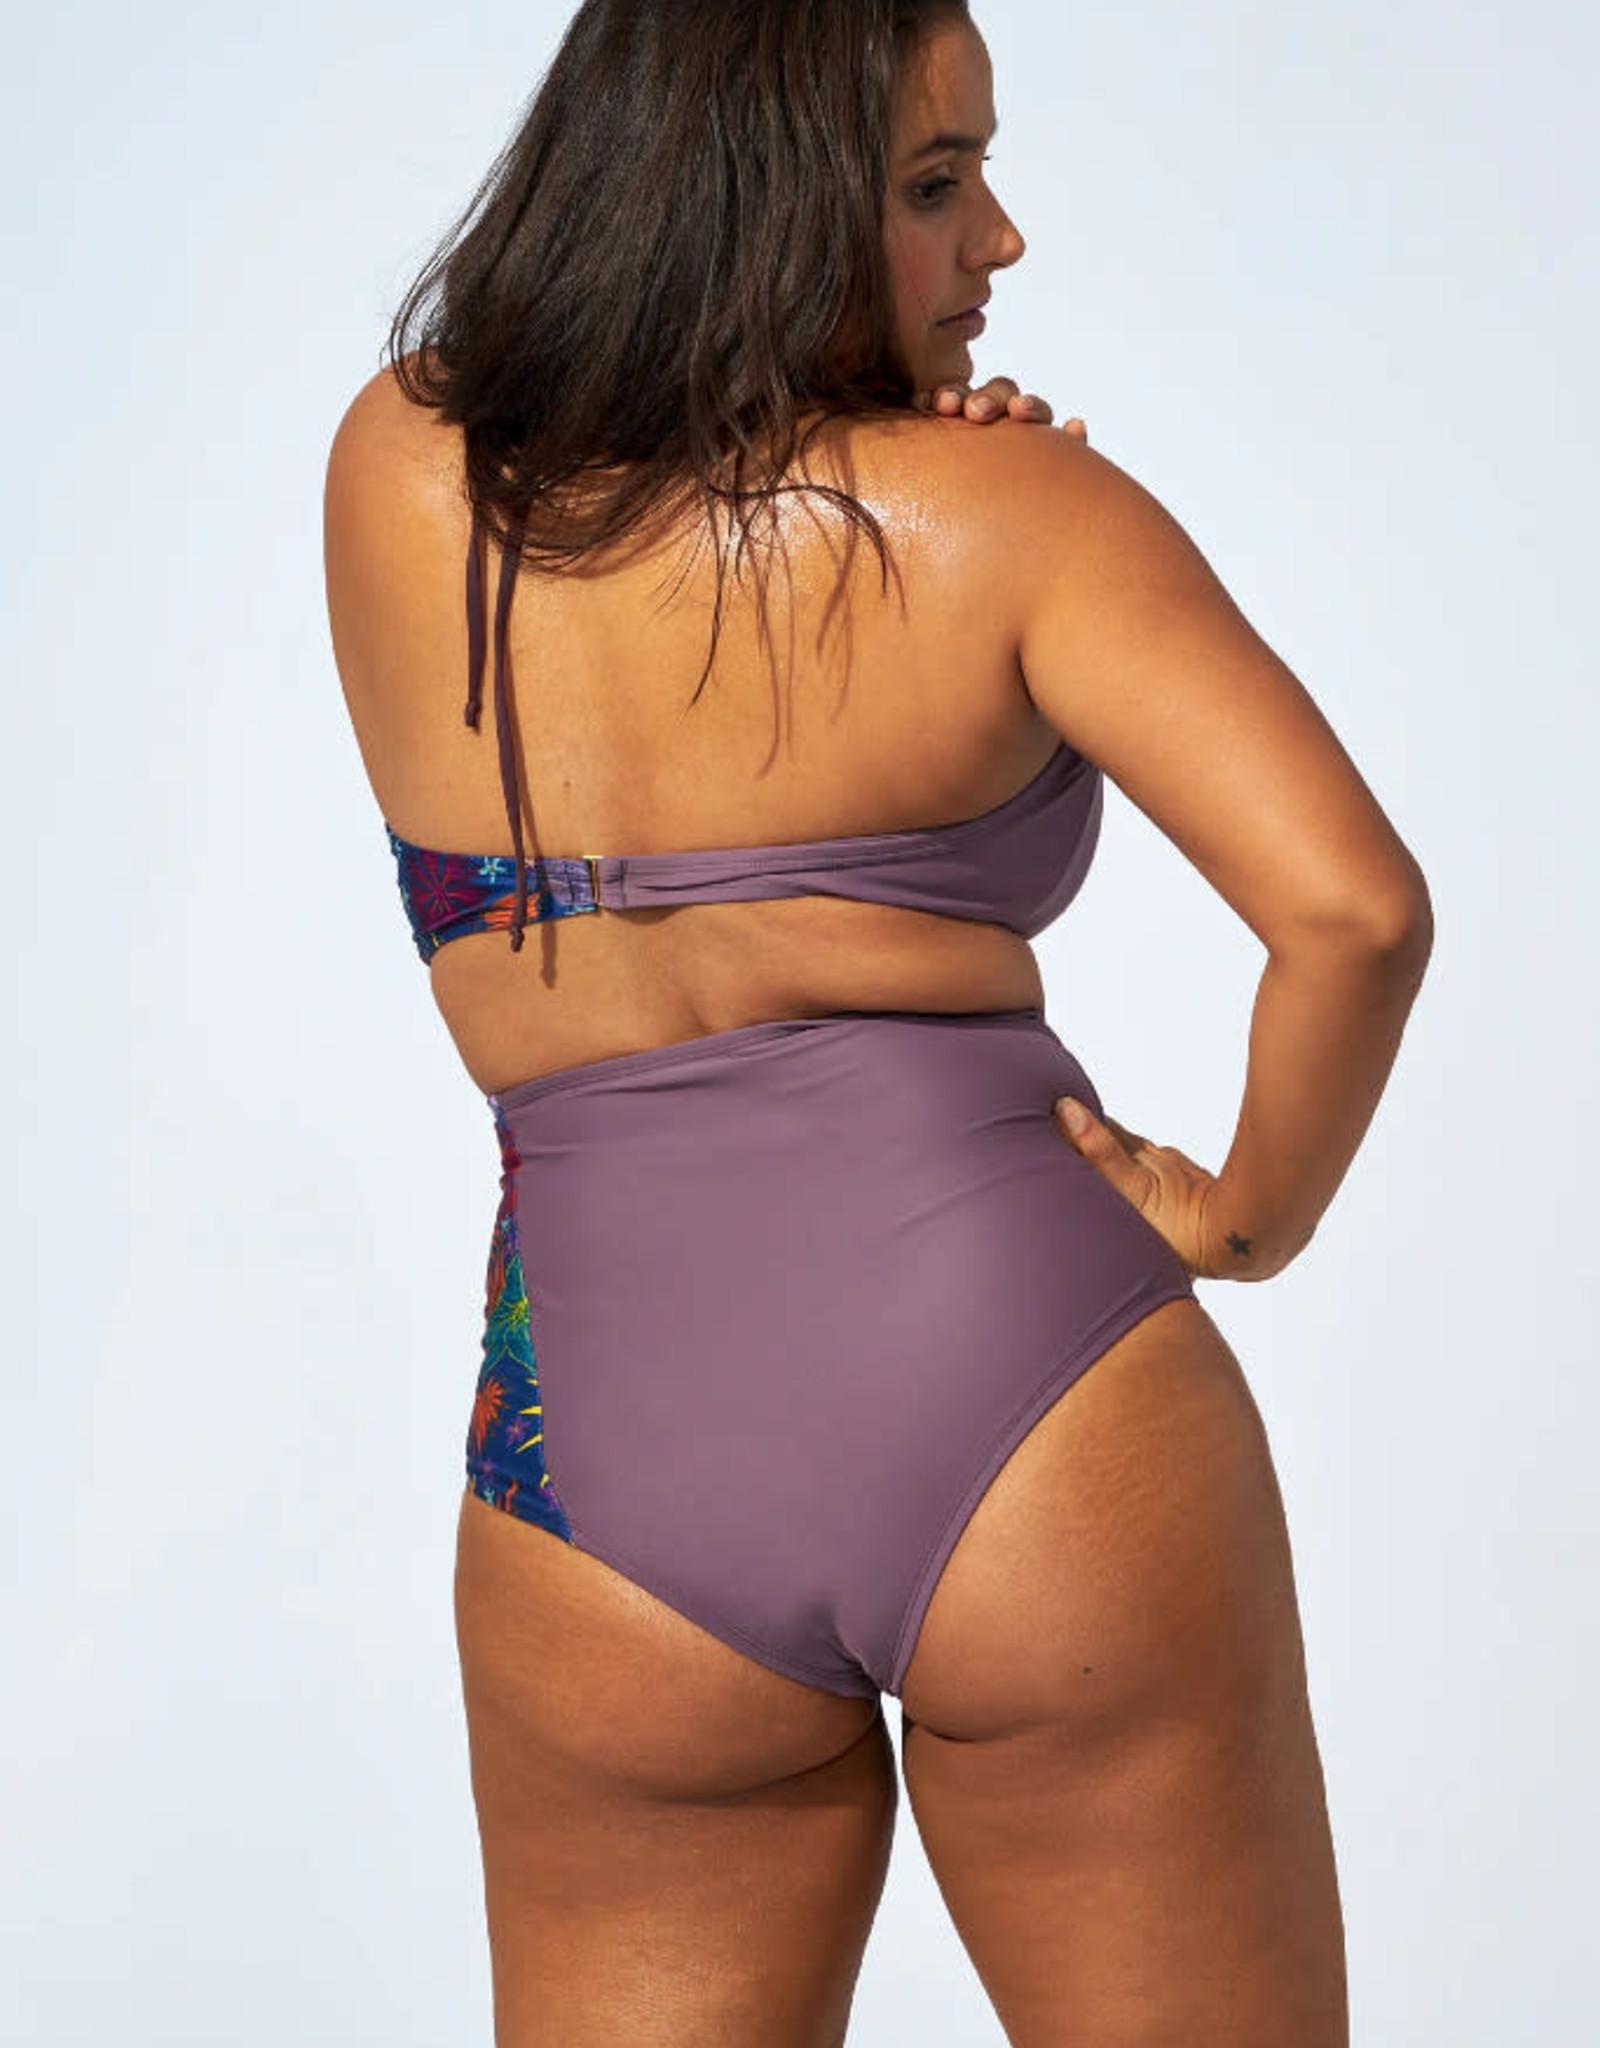 Selfish Swimwear Bas de bikini taille haute Florence Selfish Swimwear PE21 Mauve-Floral